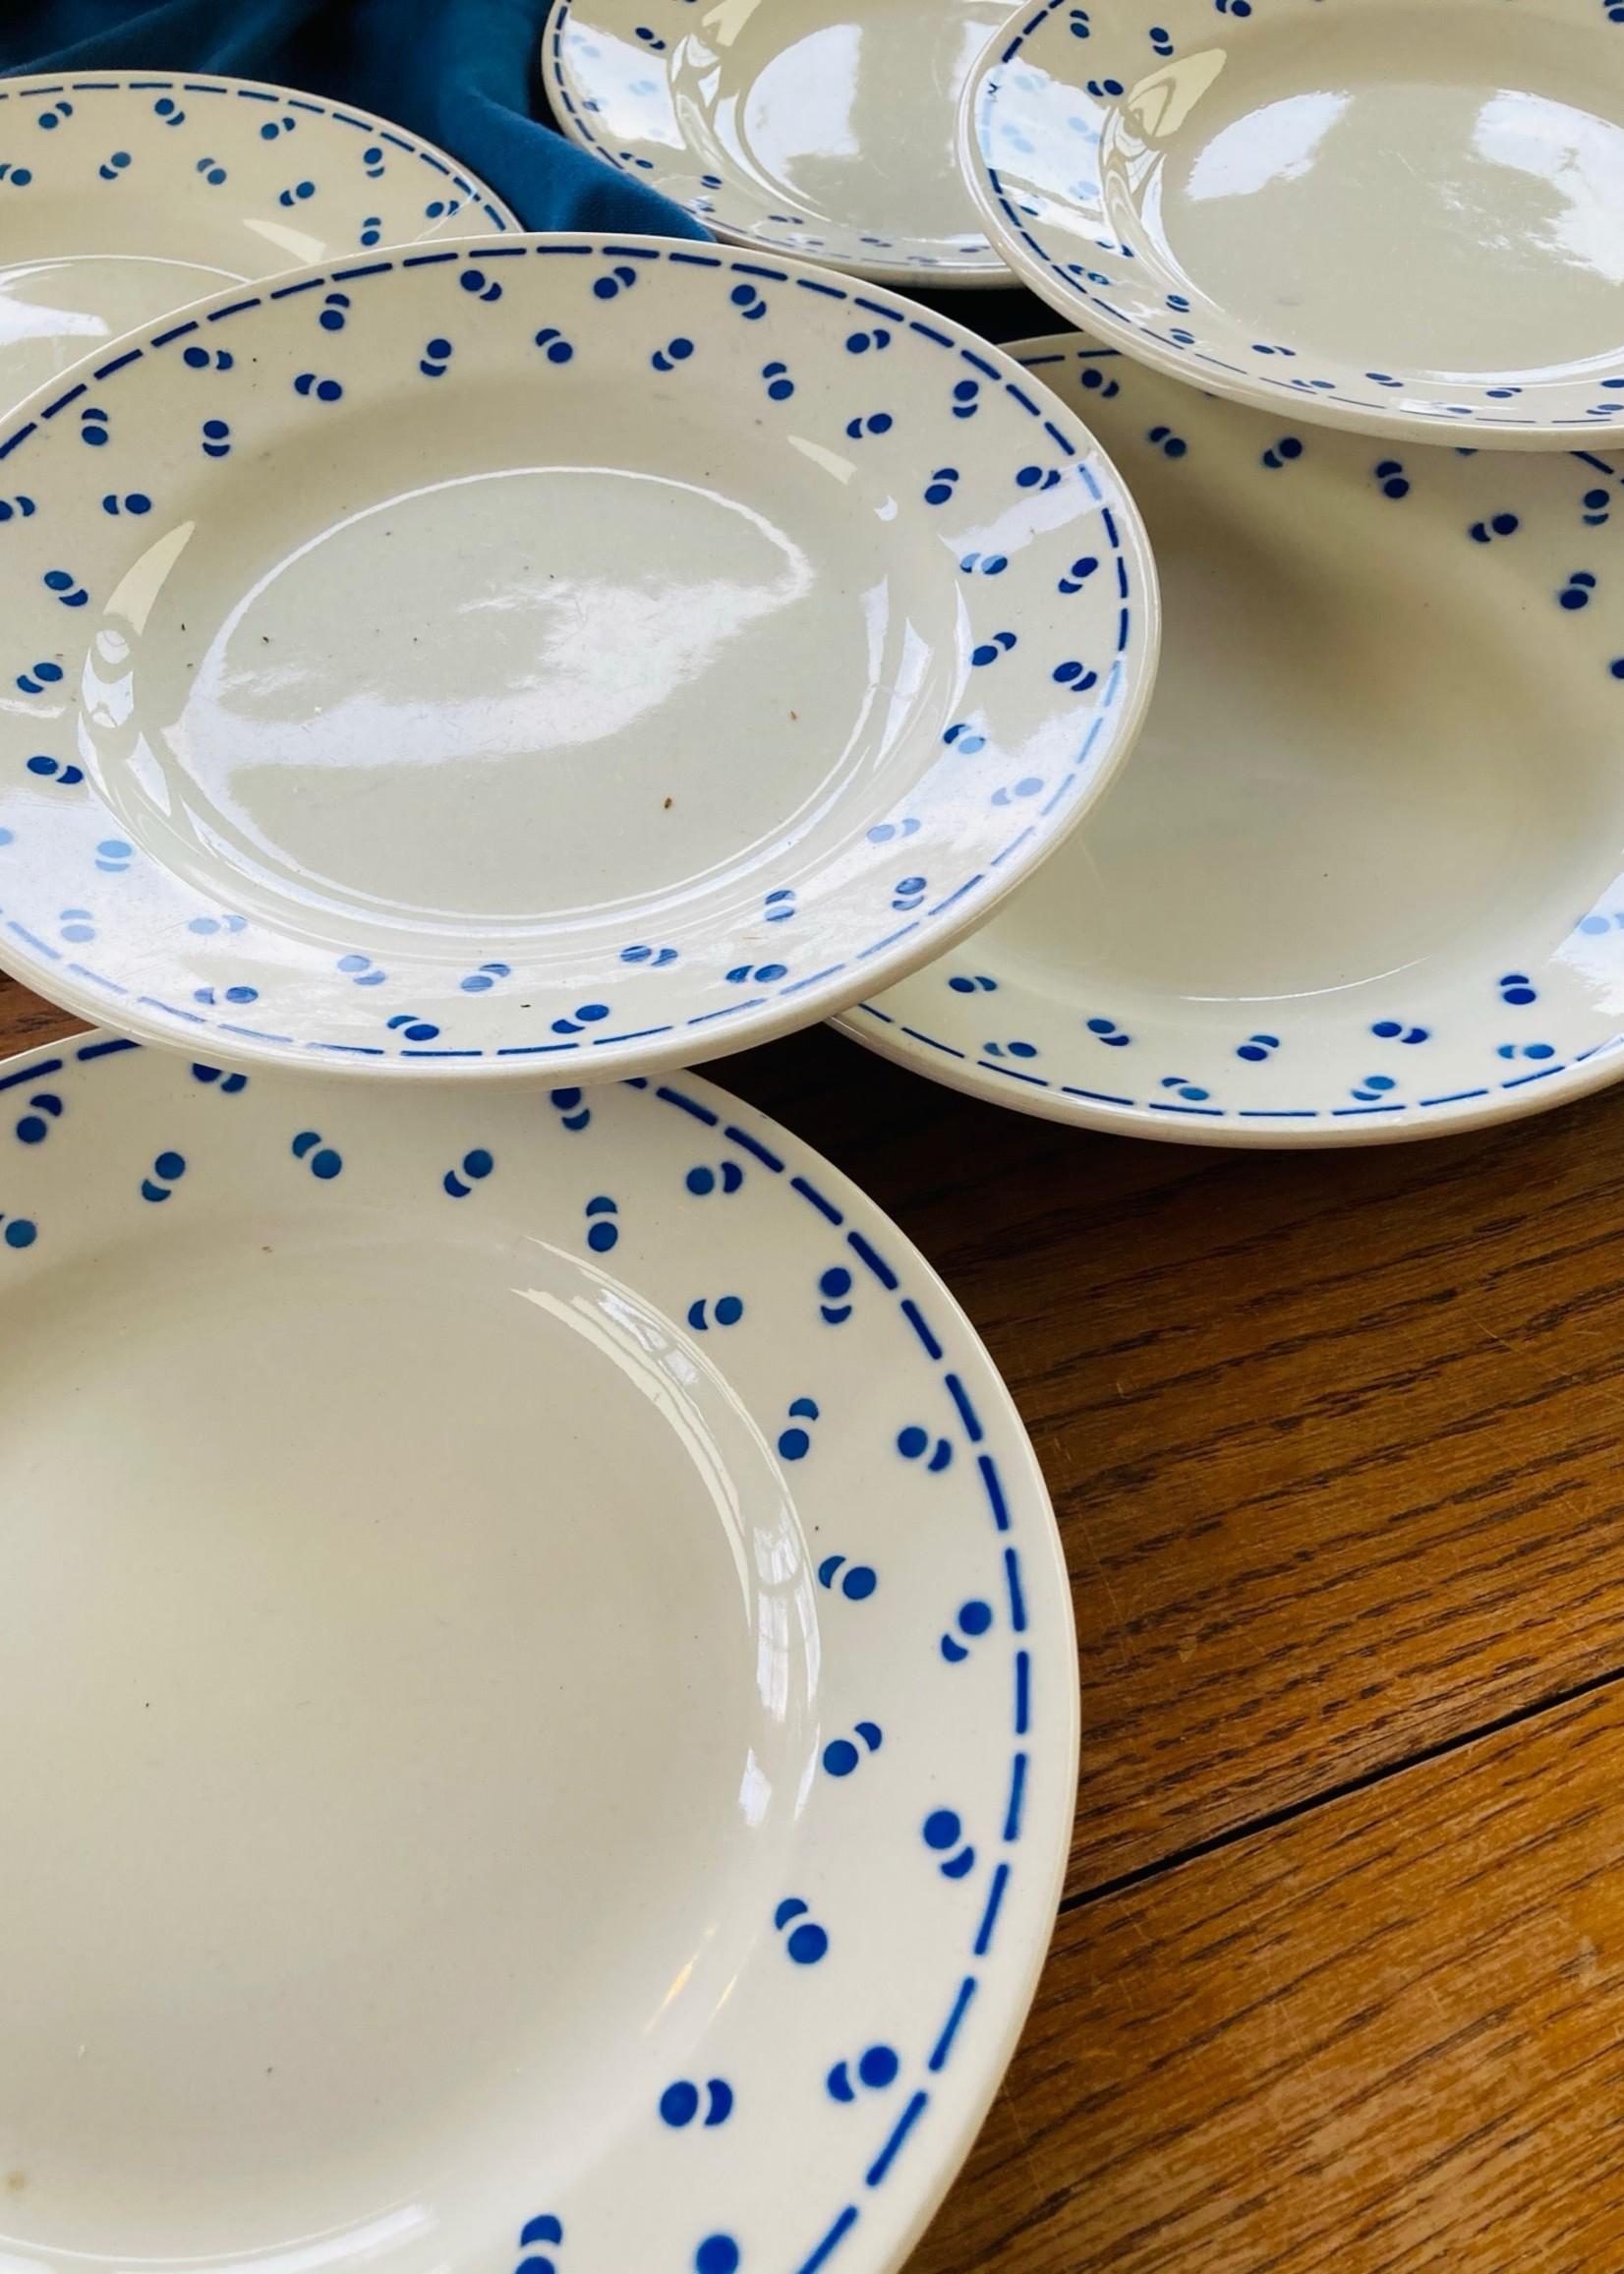 Dessert plates deco Blue confettis Boch